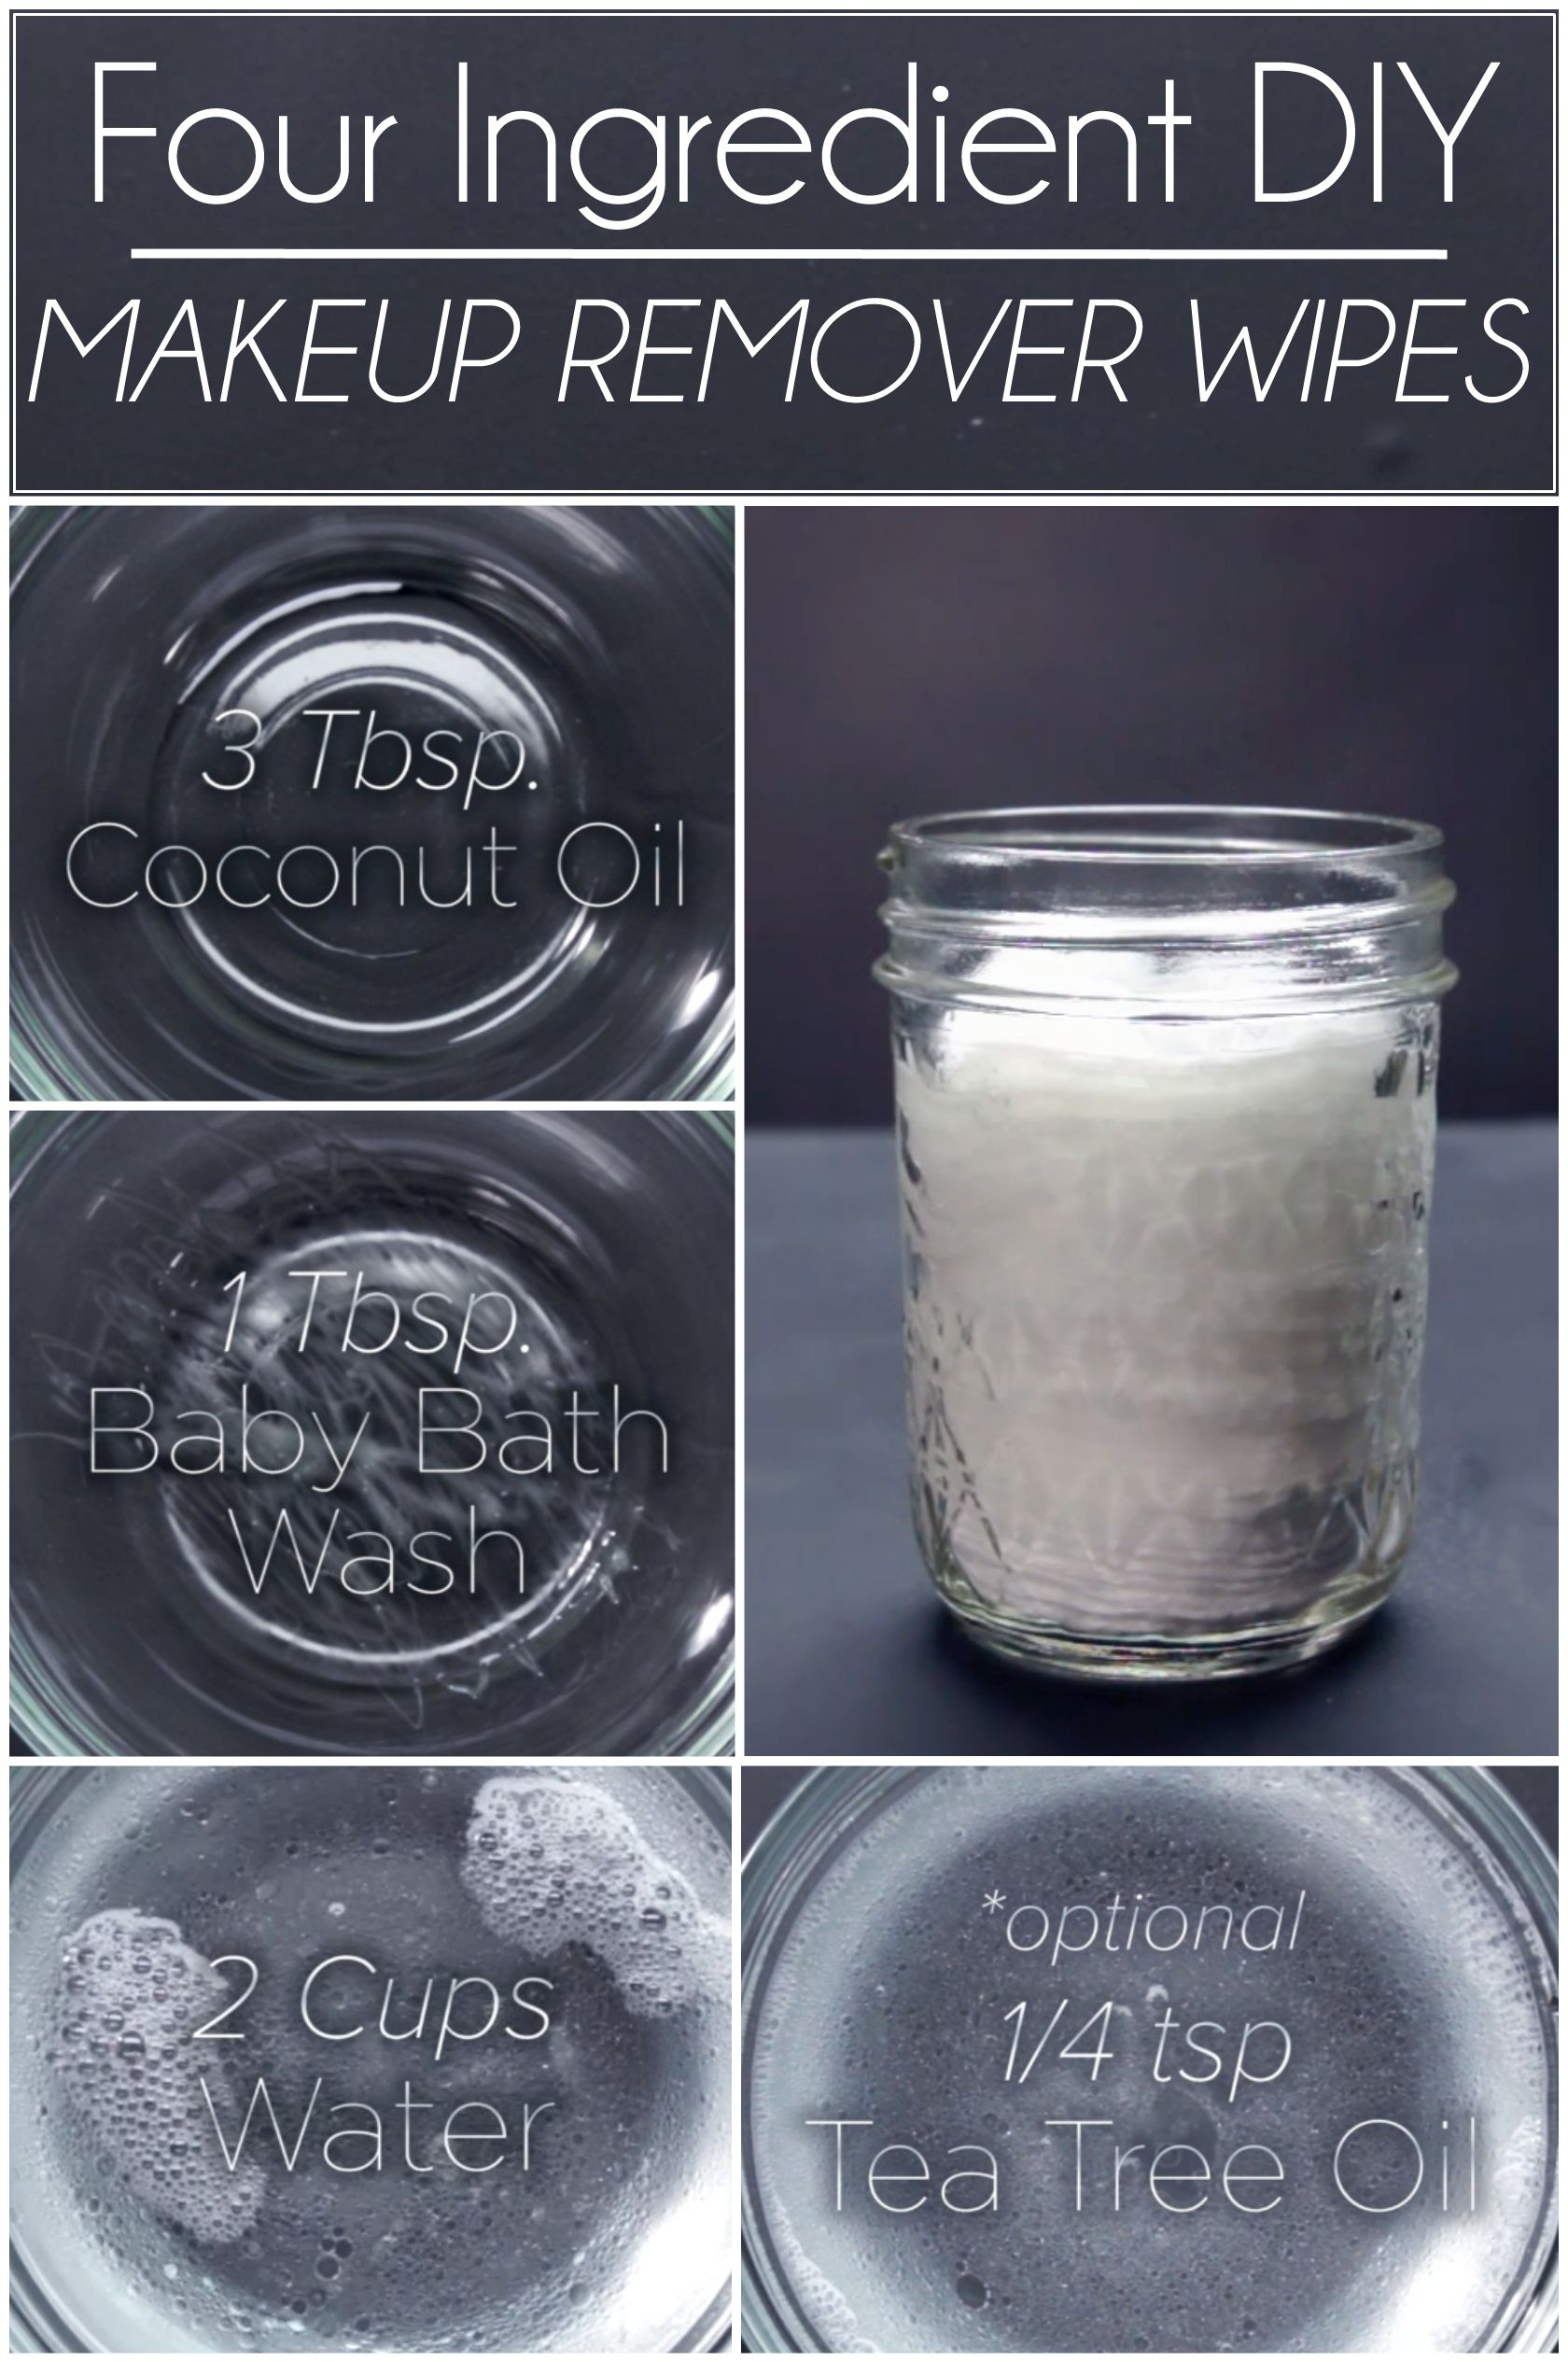 die besten 25 schminke entferner ideen auf pinterest kokos l make up entferner kokosnuss l. Black Bedroom Furniture Sets. Home Design Ideas